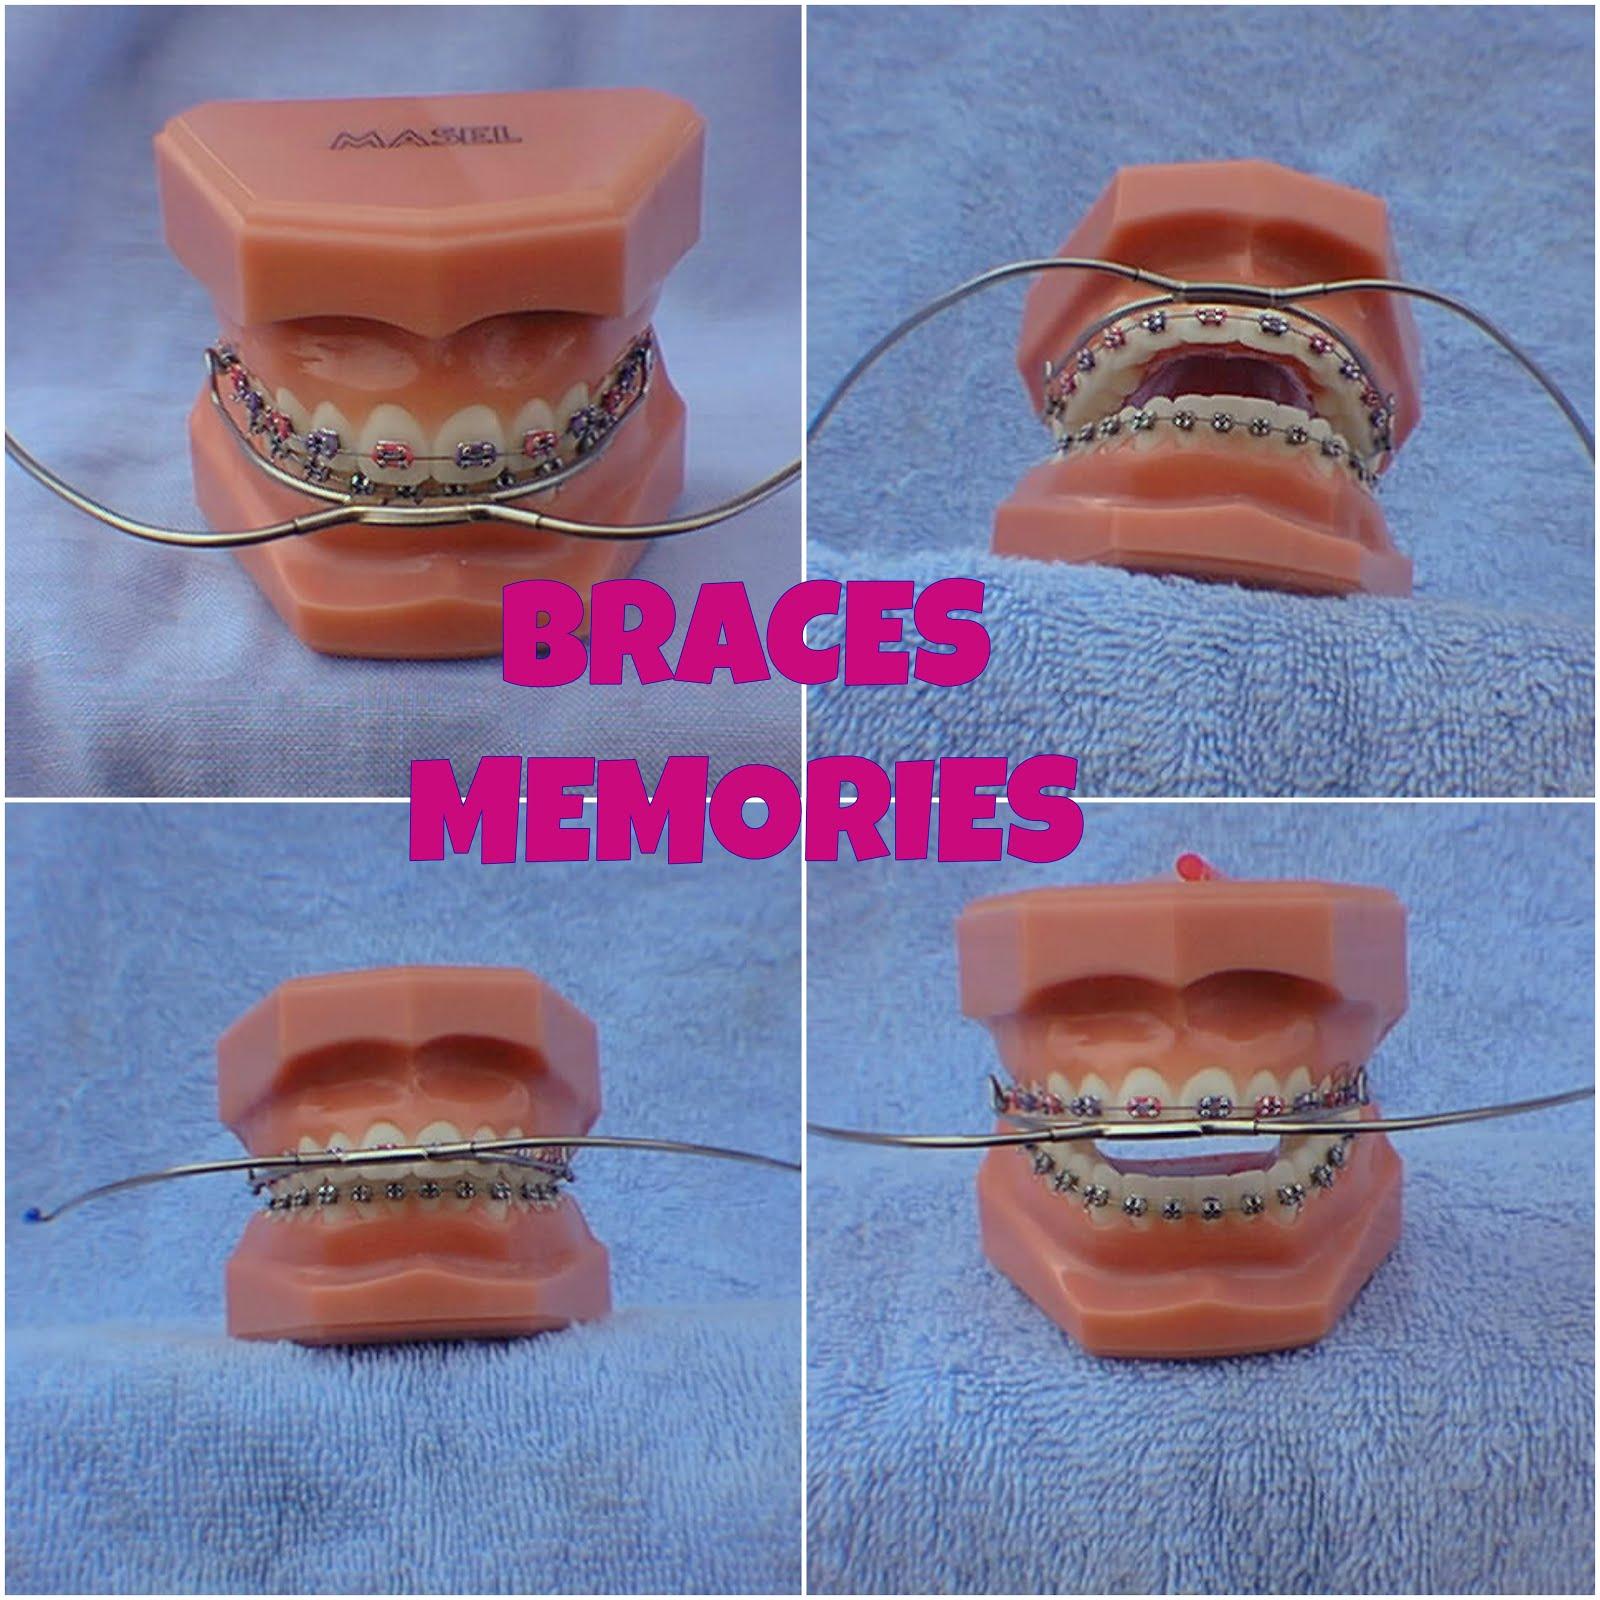 Braces Memories: Mouthwear Stories: Finishing The Treatment